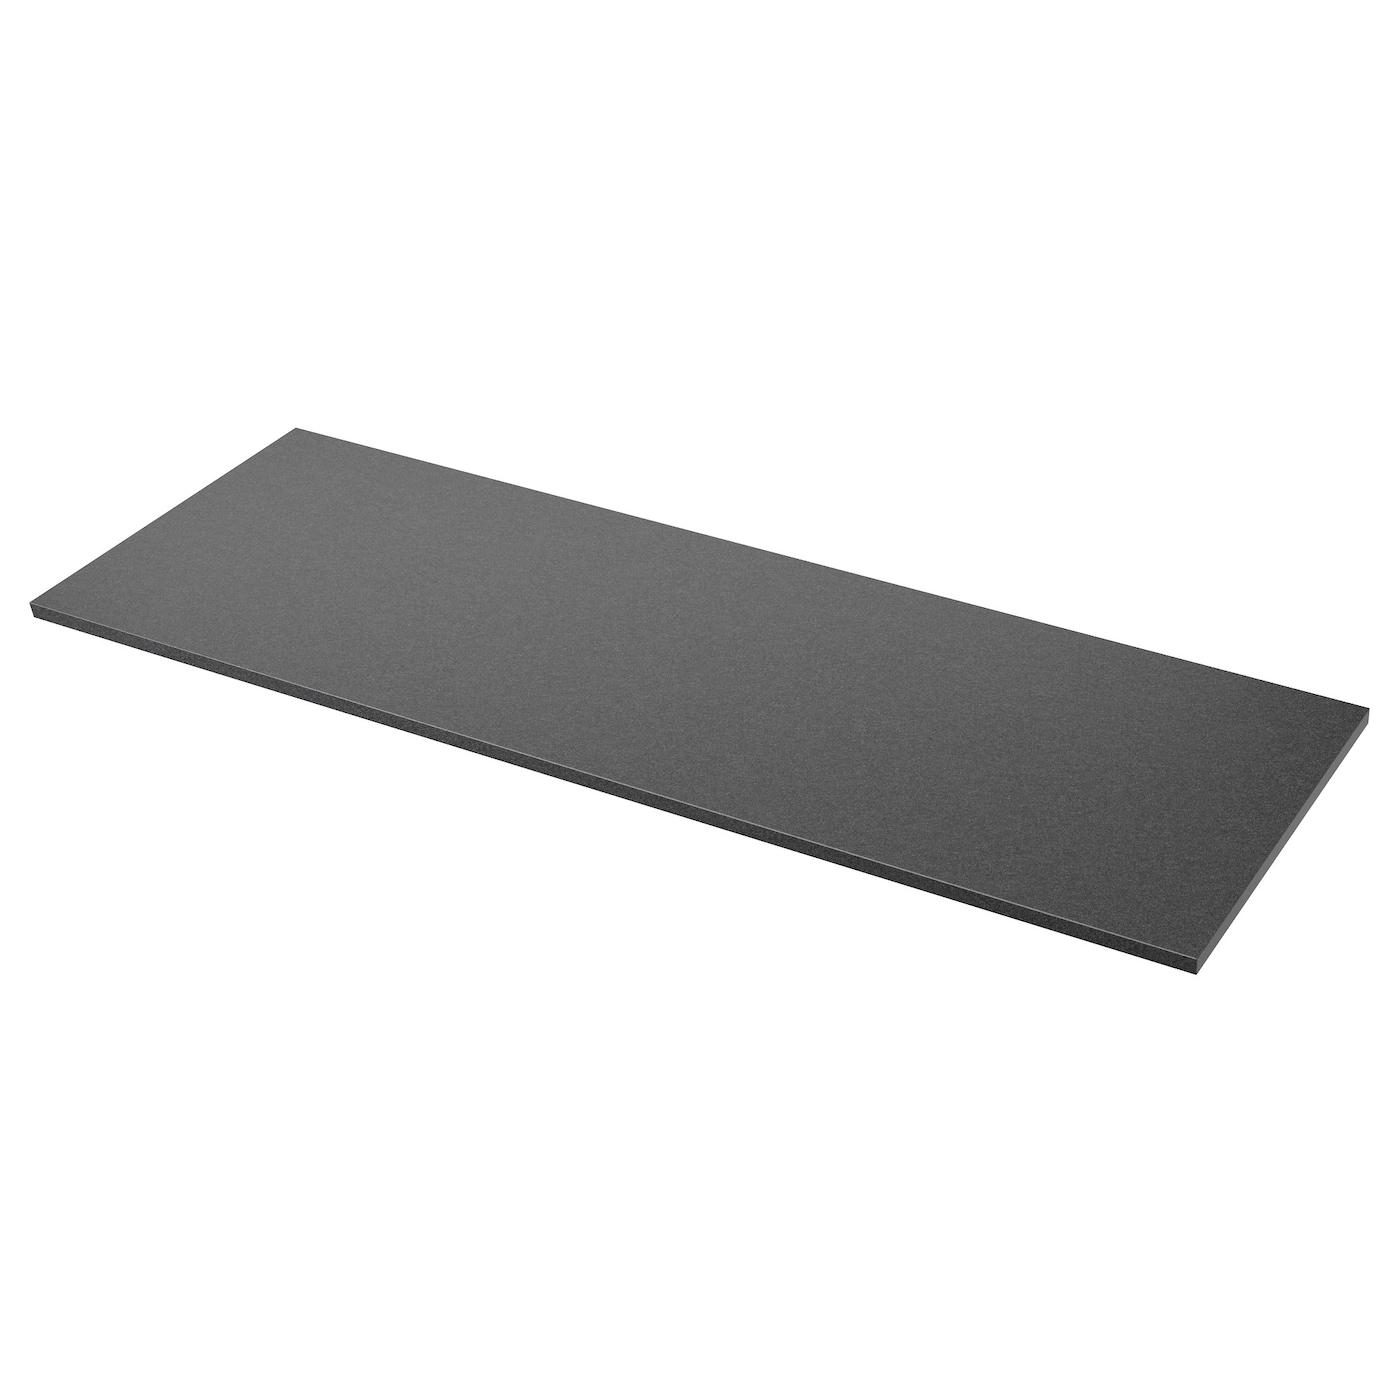 EKBACKEN Plan de travail sur mesure - noir motif pierre, stratifié - IKEA